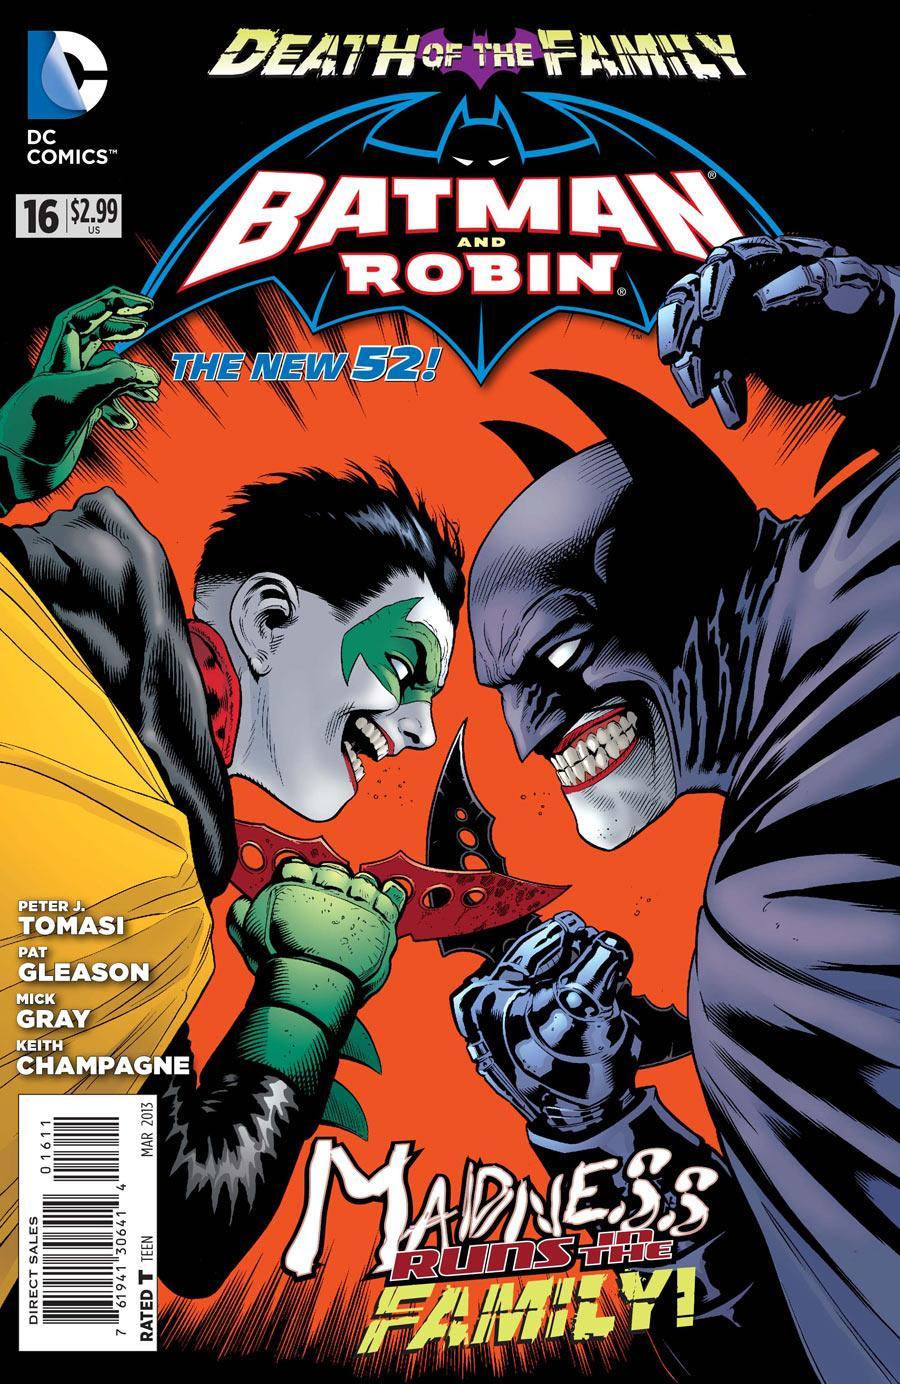 Batman & Robin 16 - Batman and Robin - Death of the Family